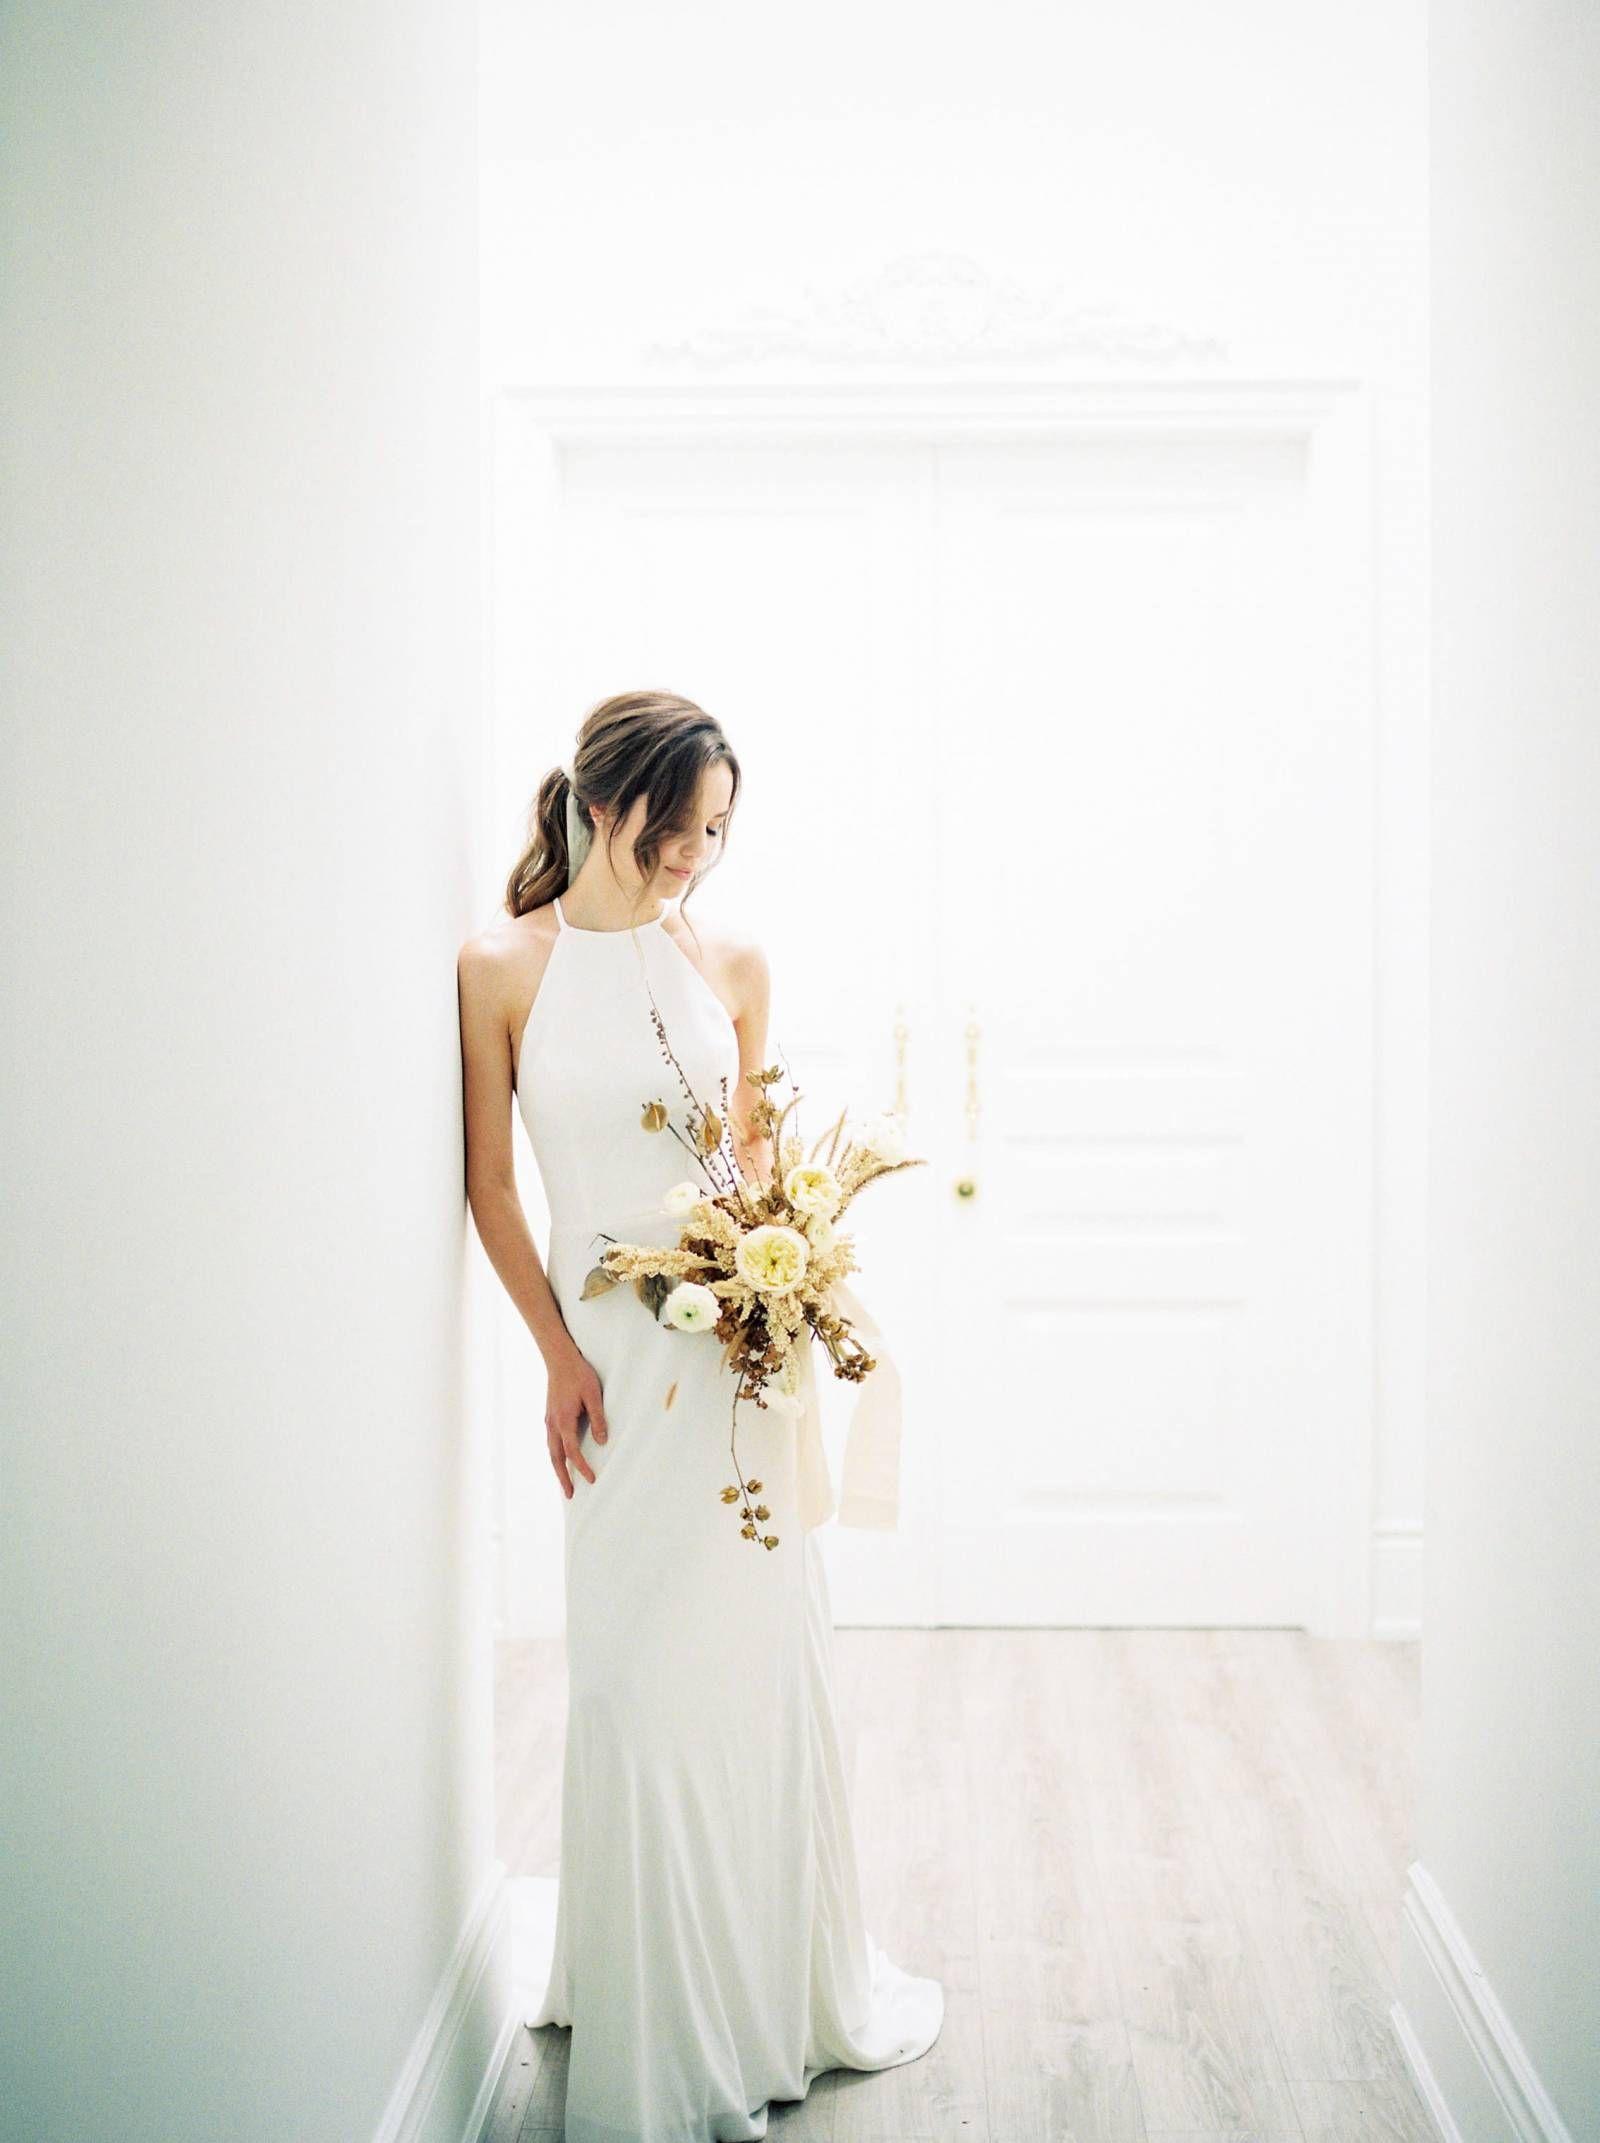 Clean Crisp Winter White Wedding Ideas Via Magnolia Rouge White Winter Wedding White Wedding Winter White